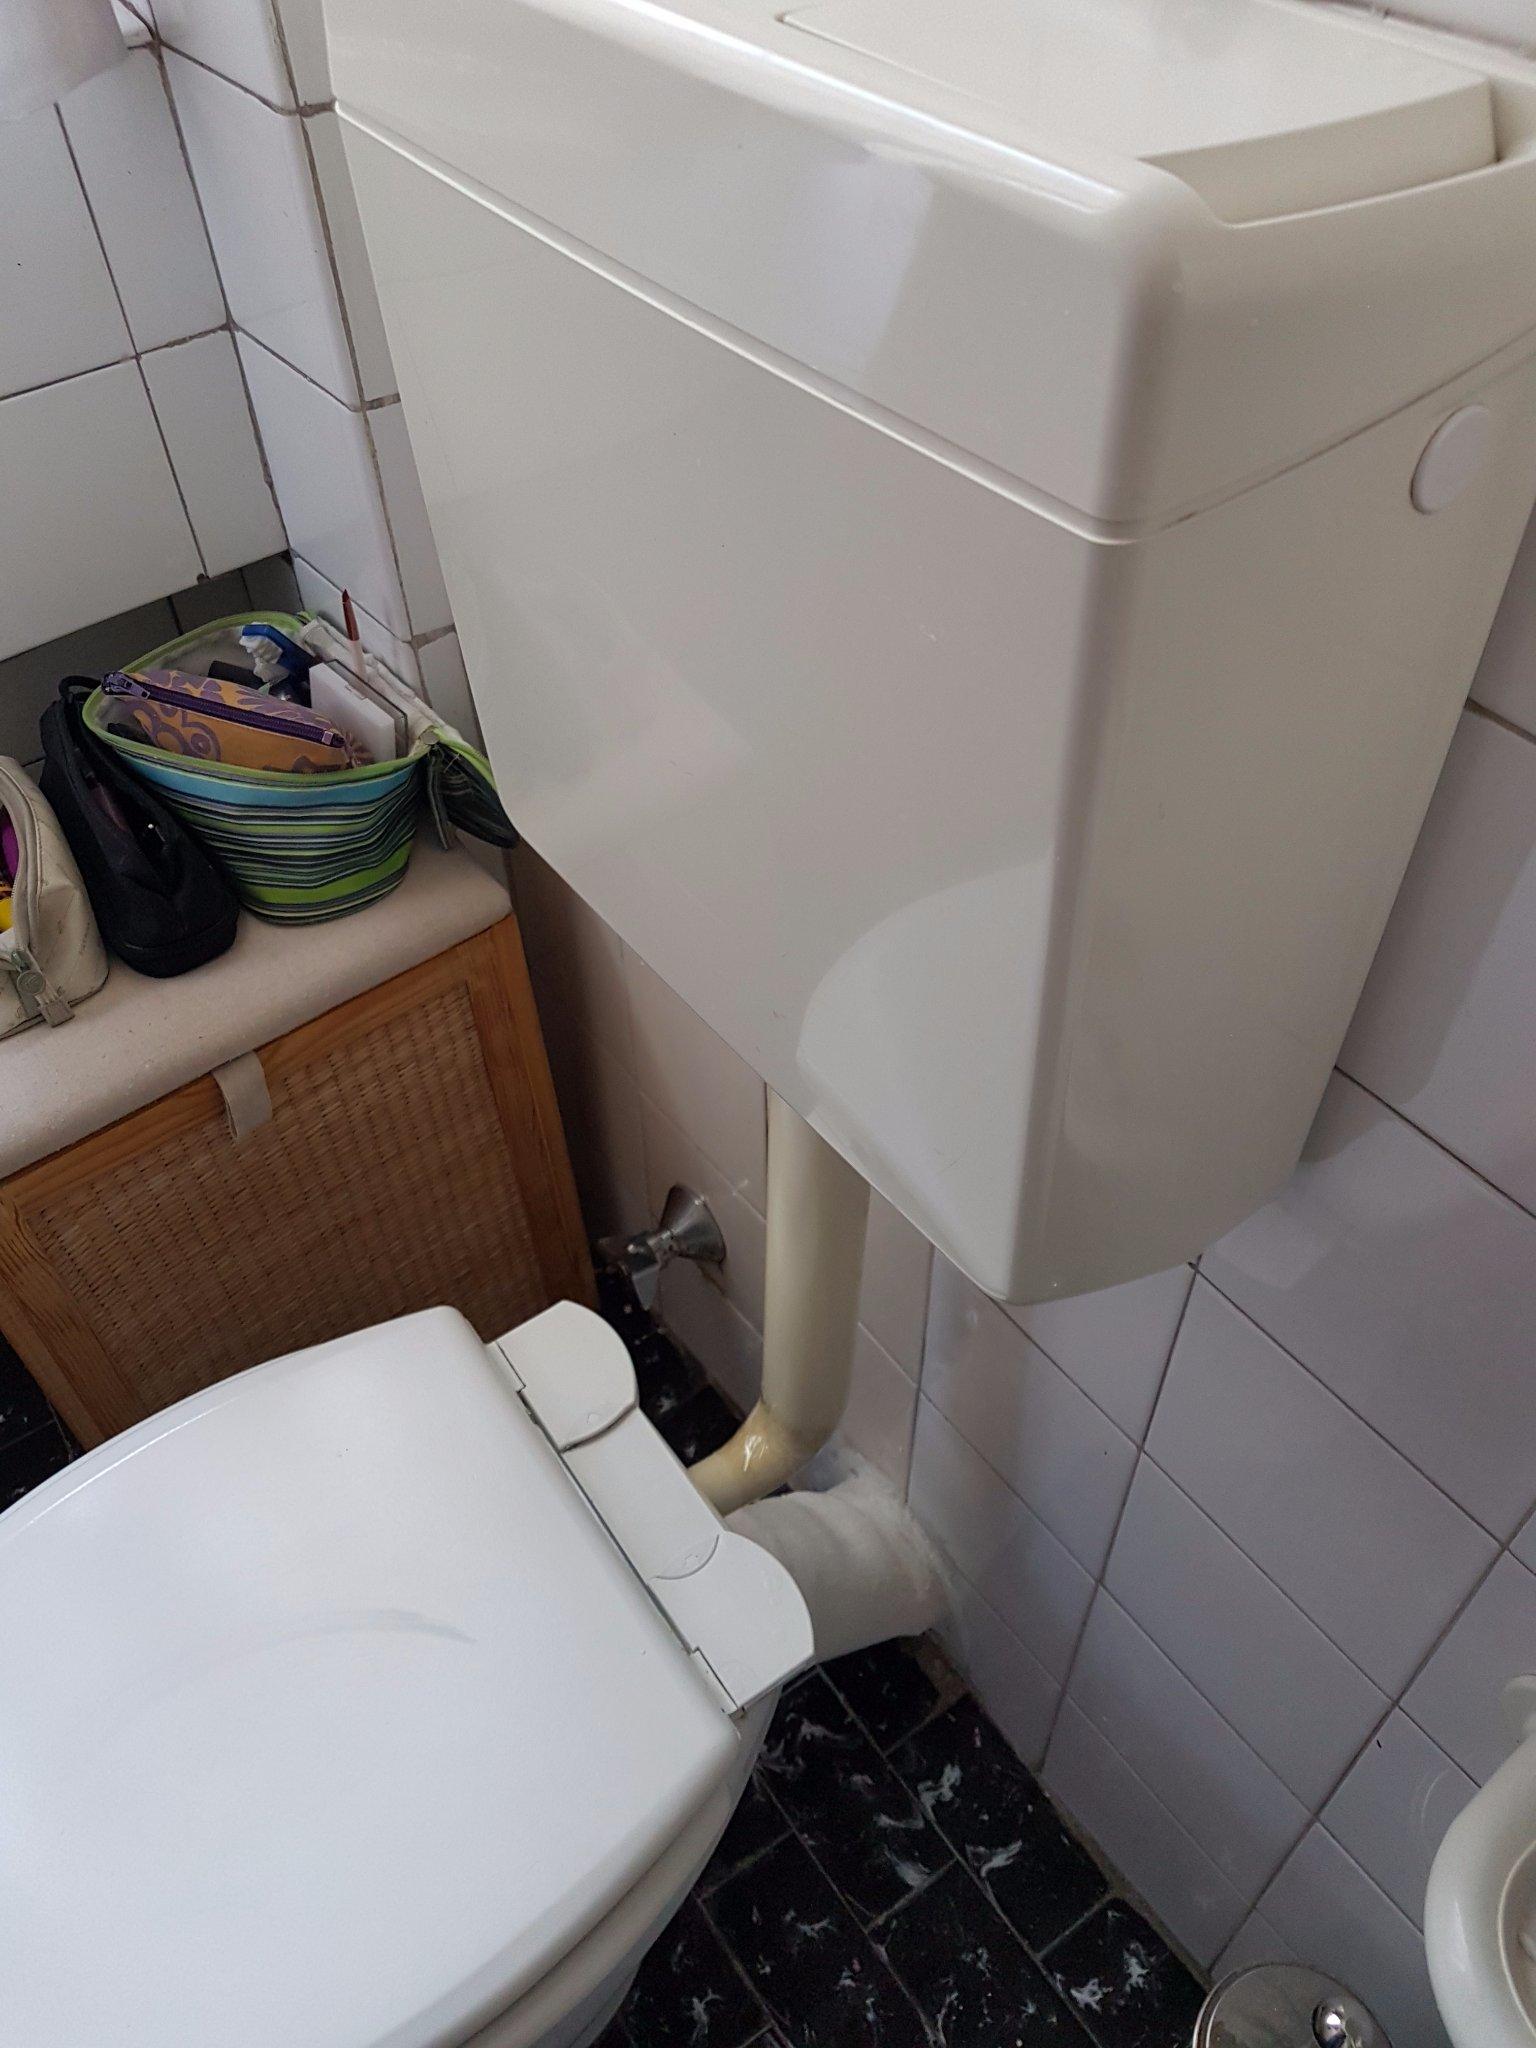 Sostituzione rubinetto cucina 28 images riparazioni sostituzione miscelatore lavello cucina - Rubinetto cucina ikea ...